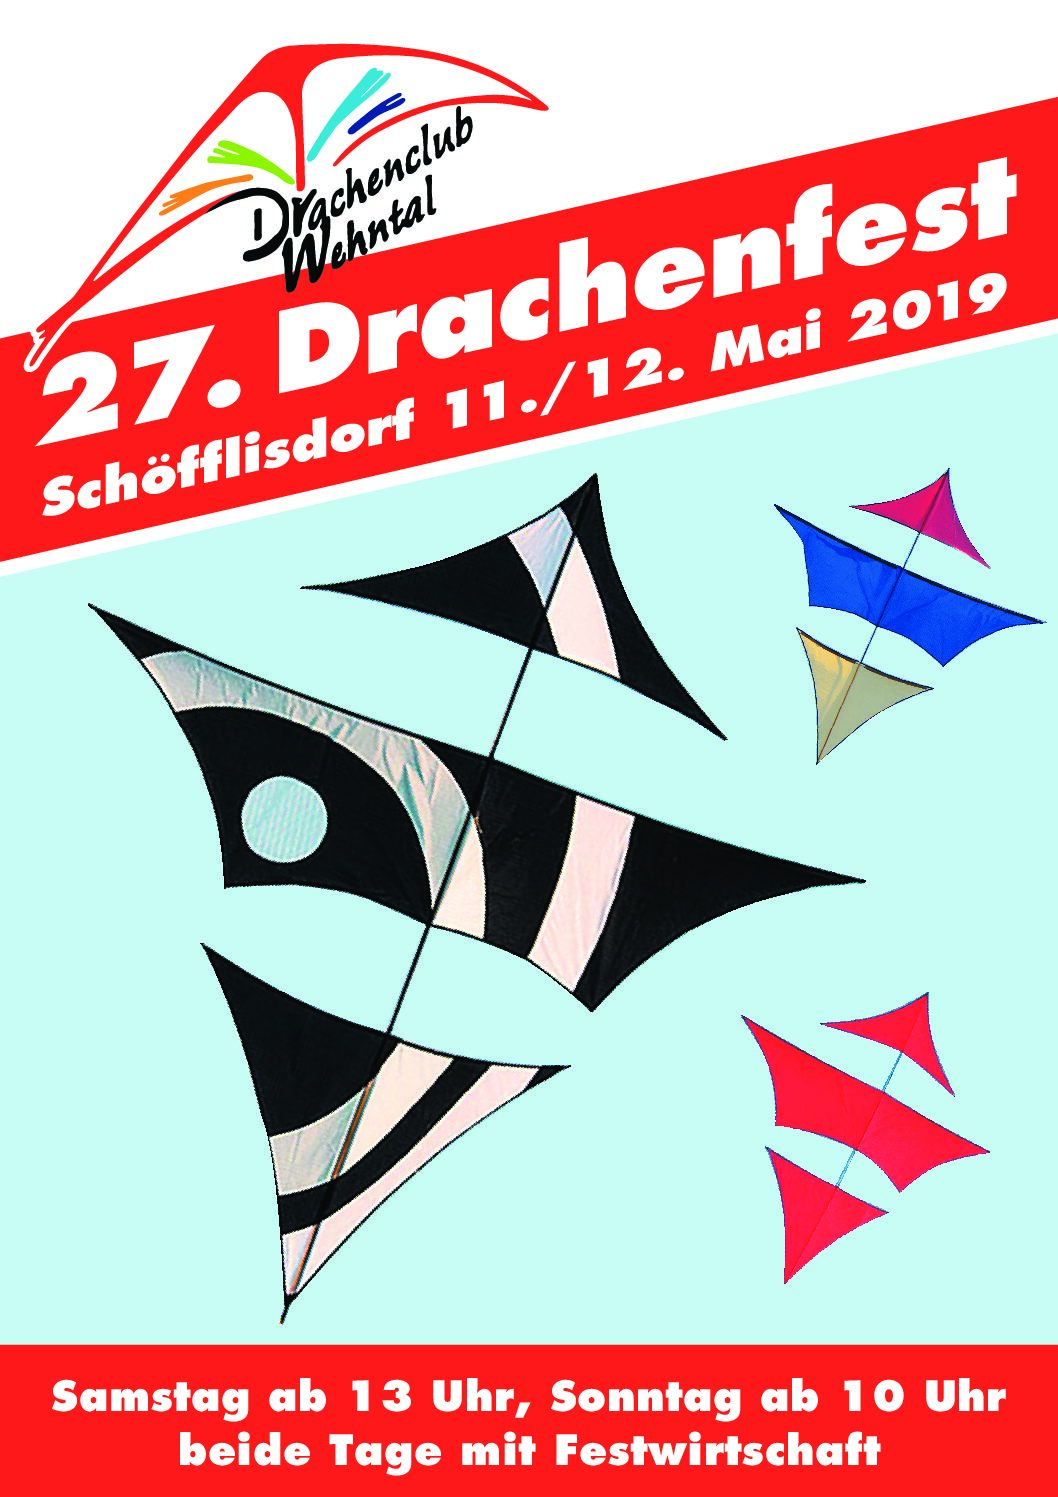 27. Drachenfest